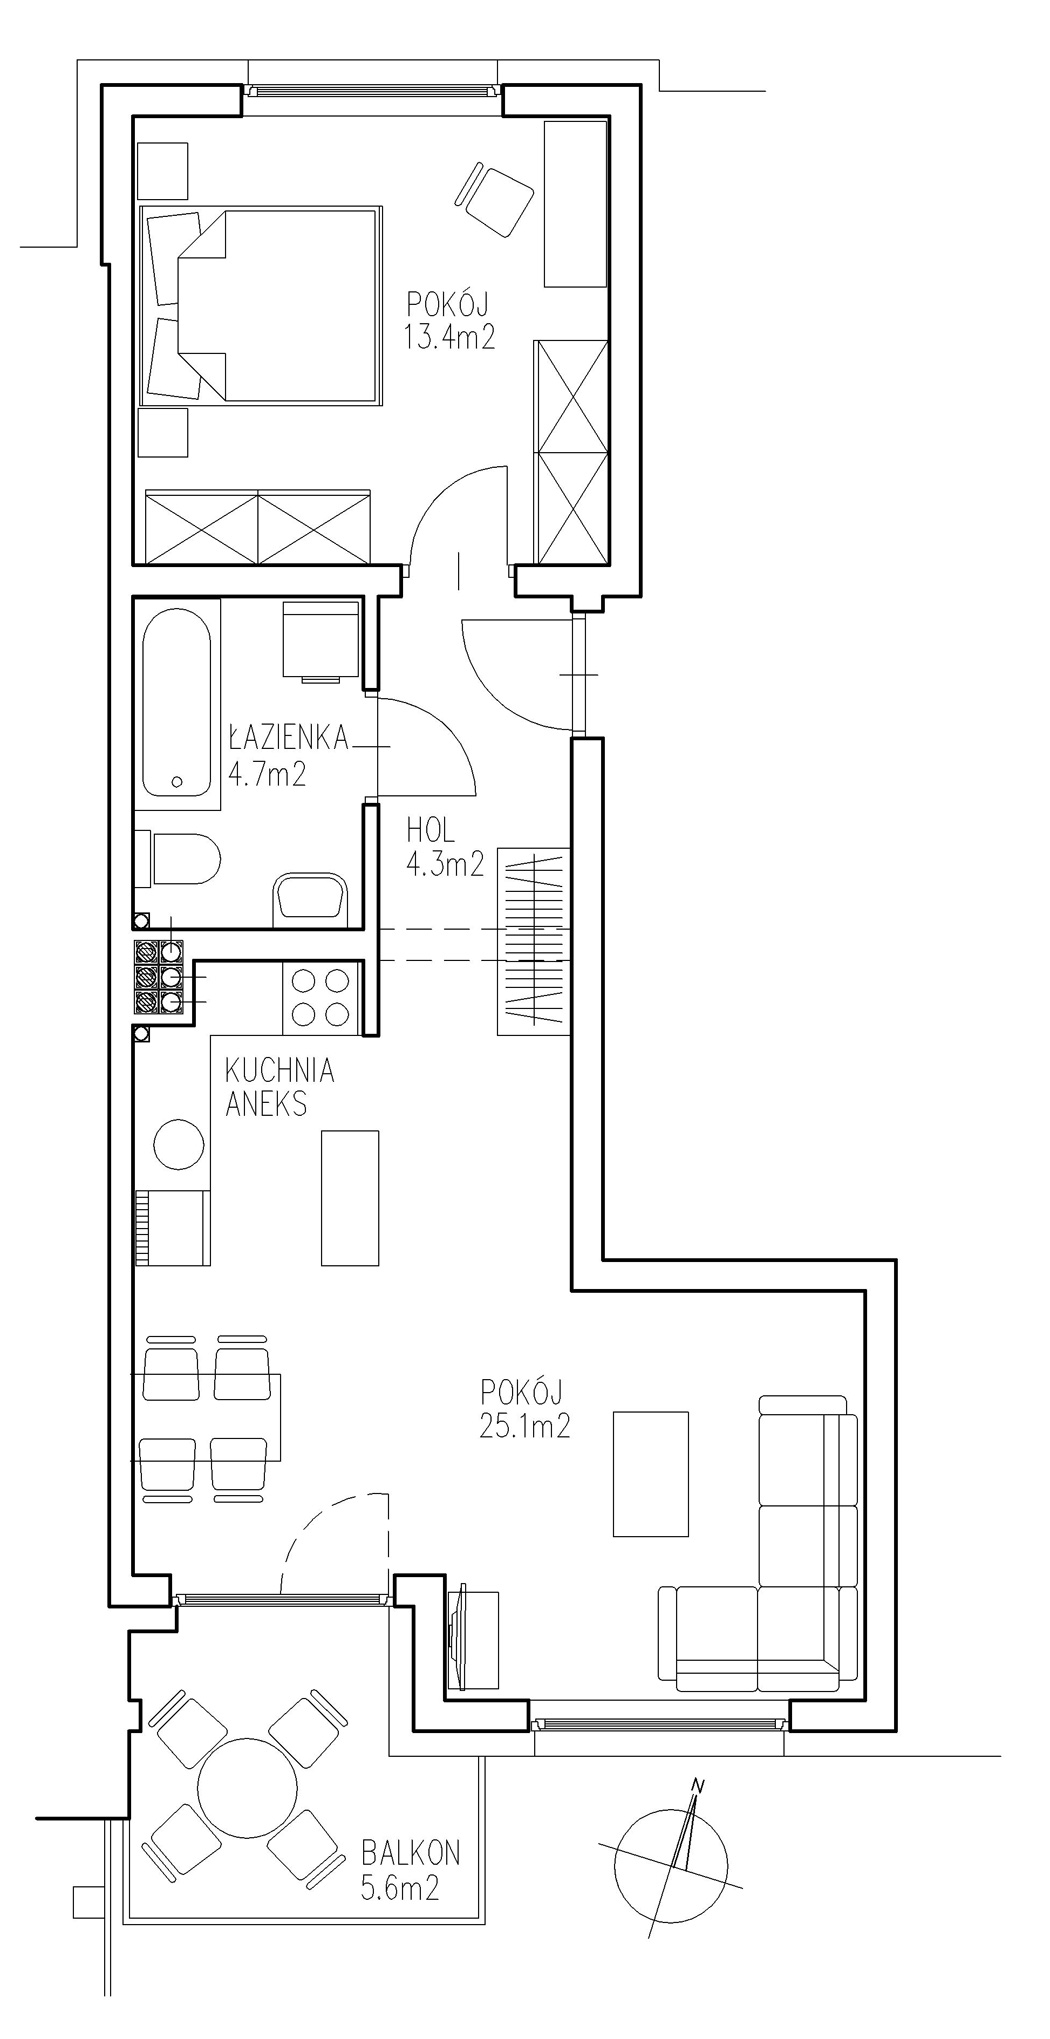 KTK Deweloper - Ełk - ul. Ogrodowa - Blok nr 2 - Mieszkanie nr 10